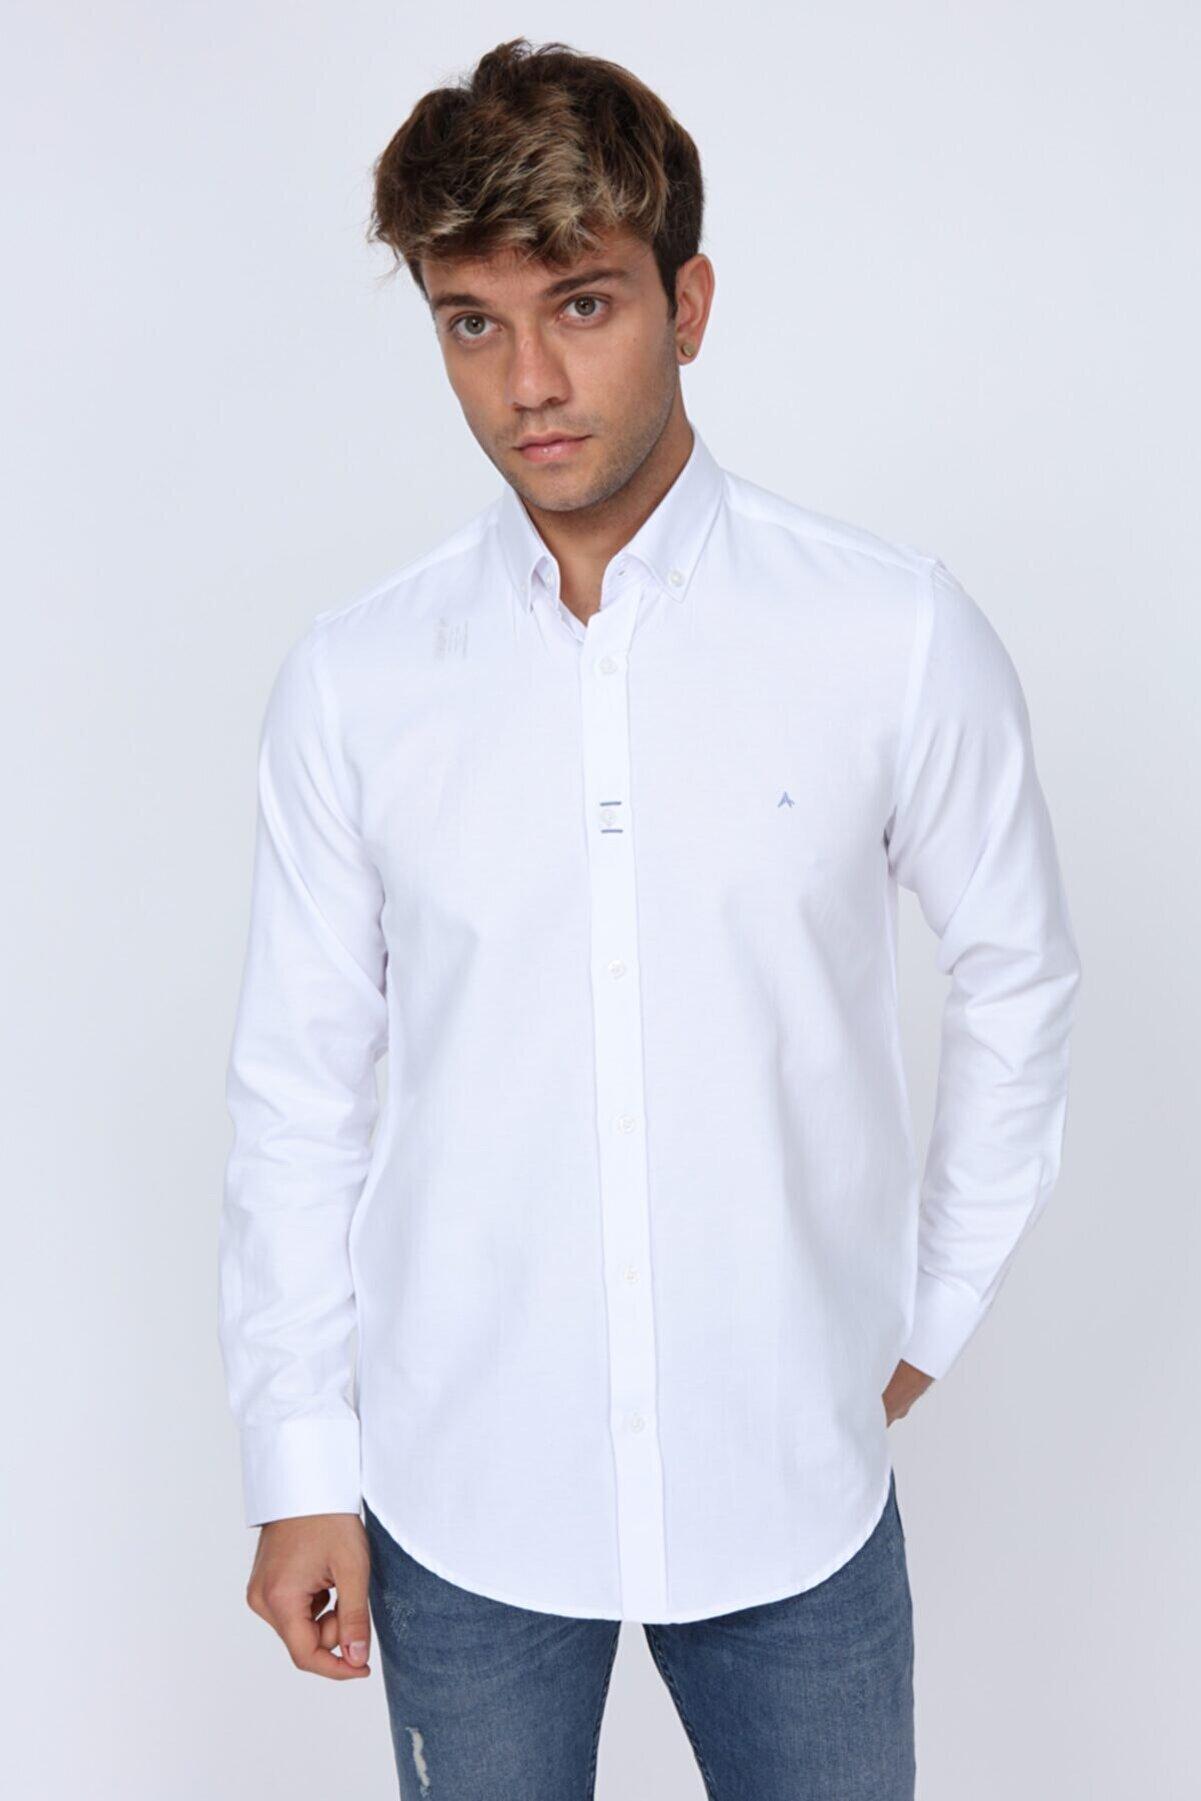 Abbate Mavi Dikiş Detaylı Slim Fit Beyaz Erkek Gömlek